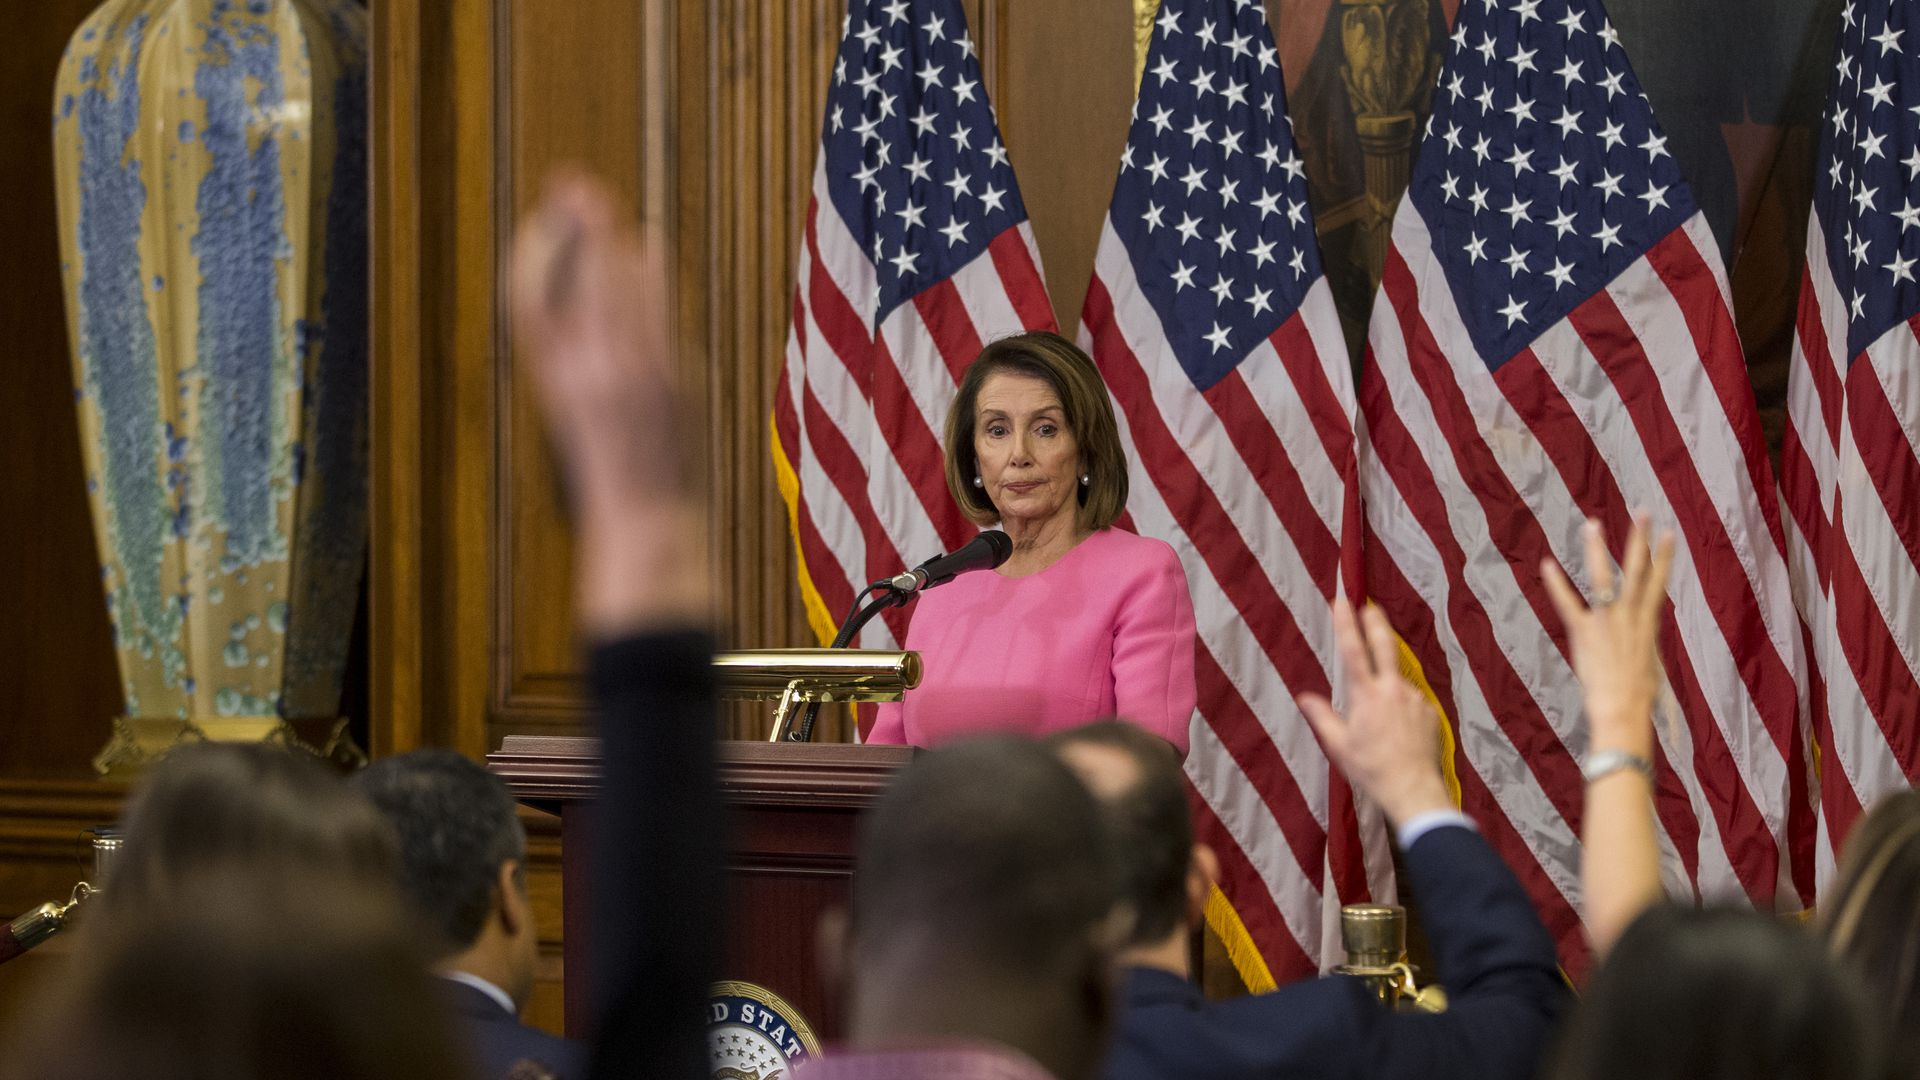 Nancy Pelosi speaking to a crowd.